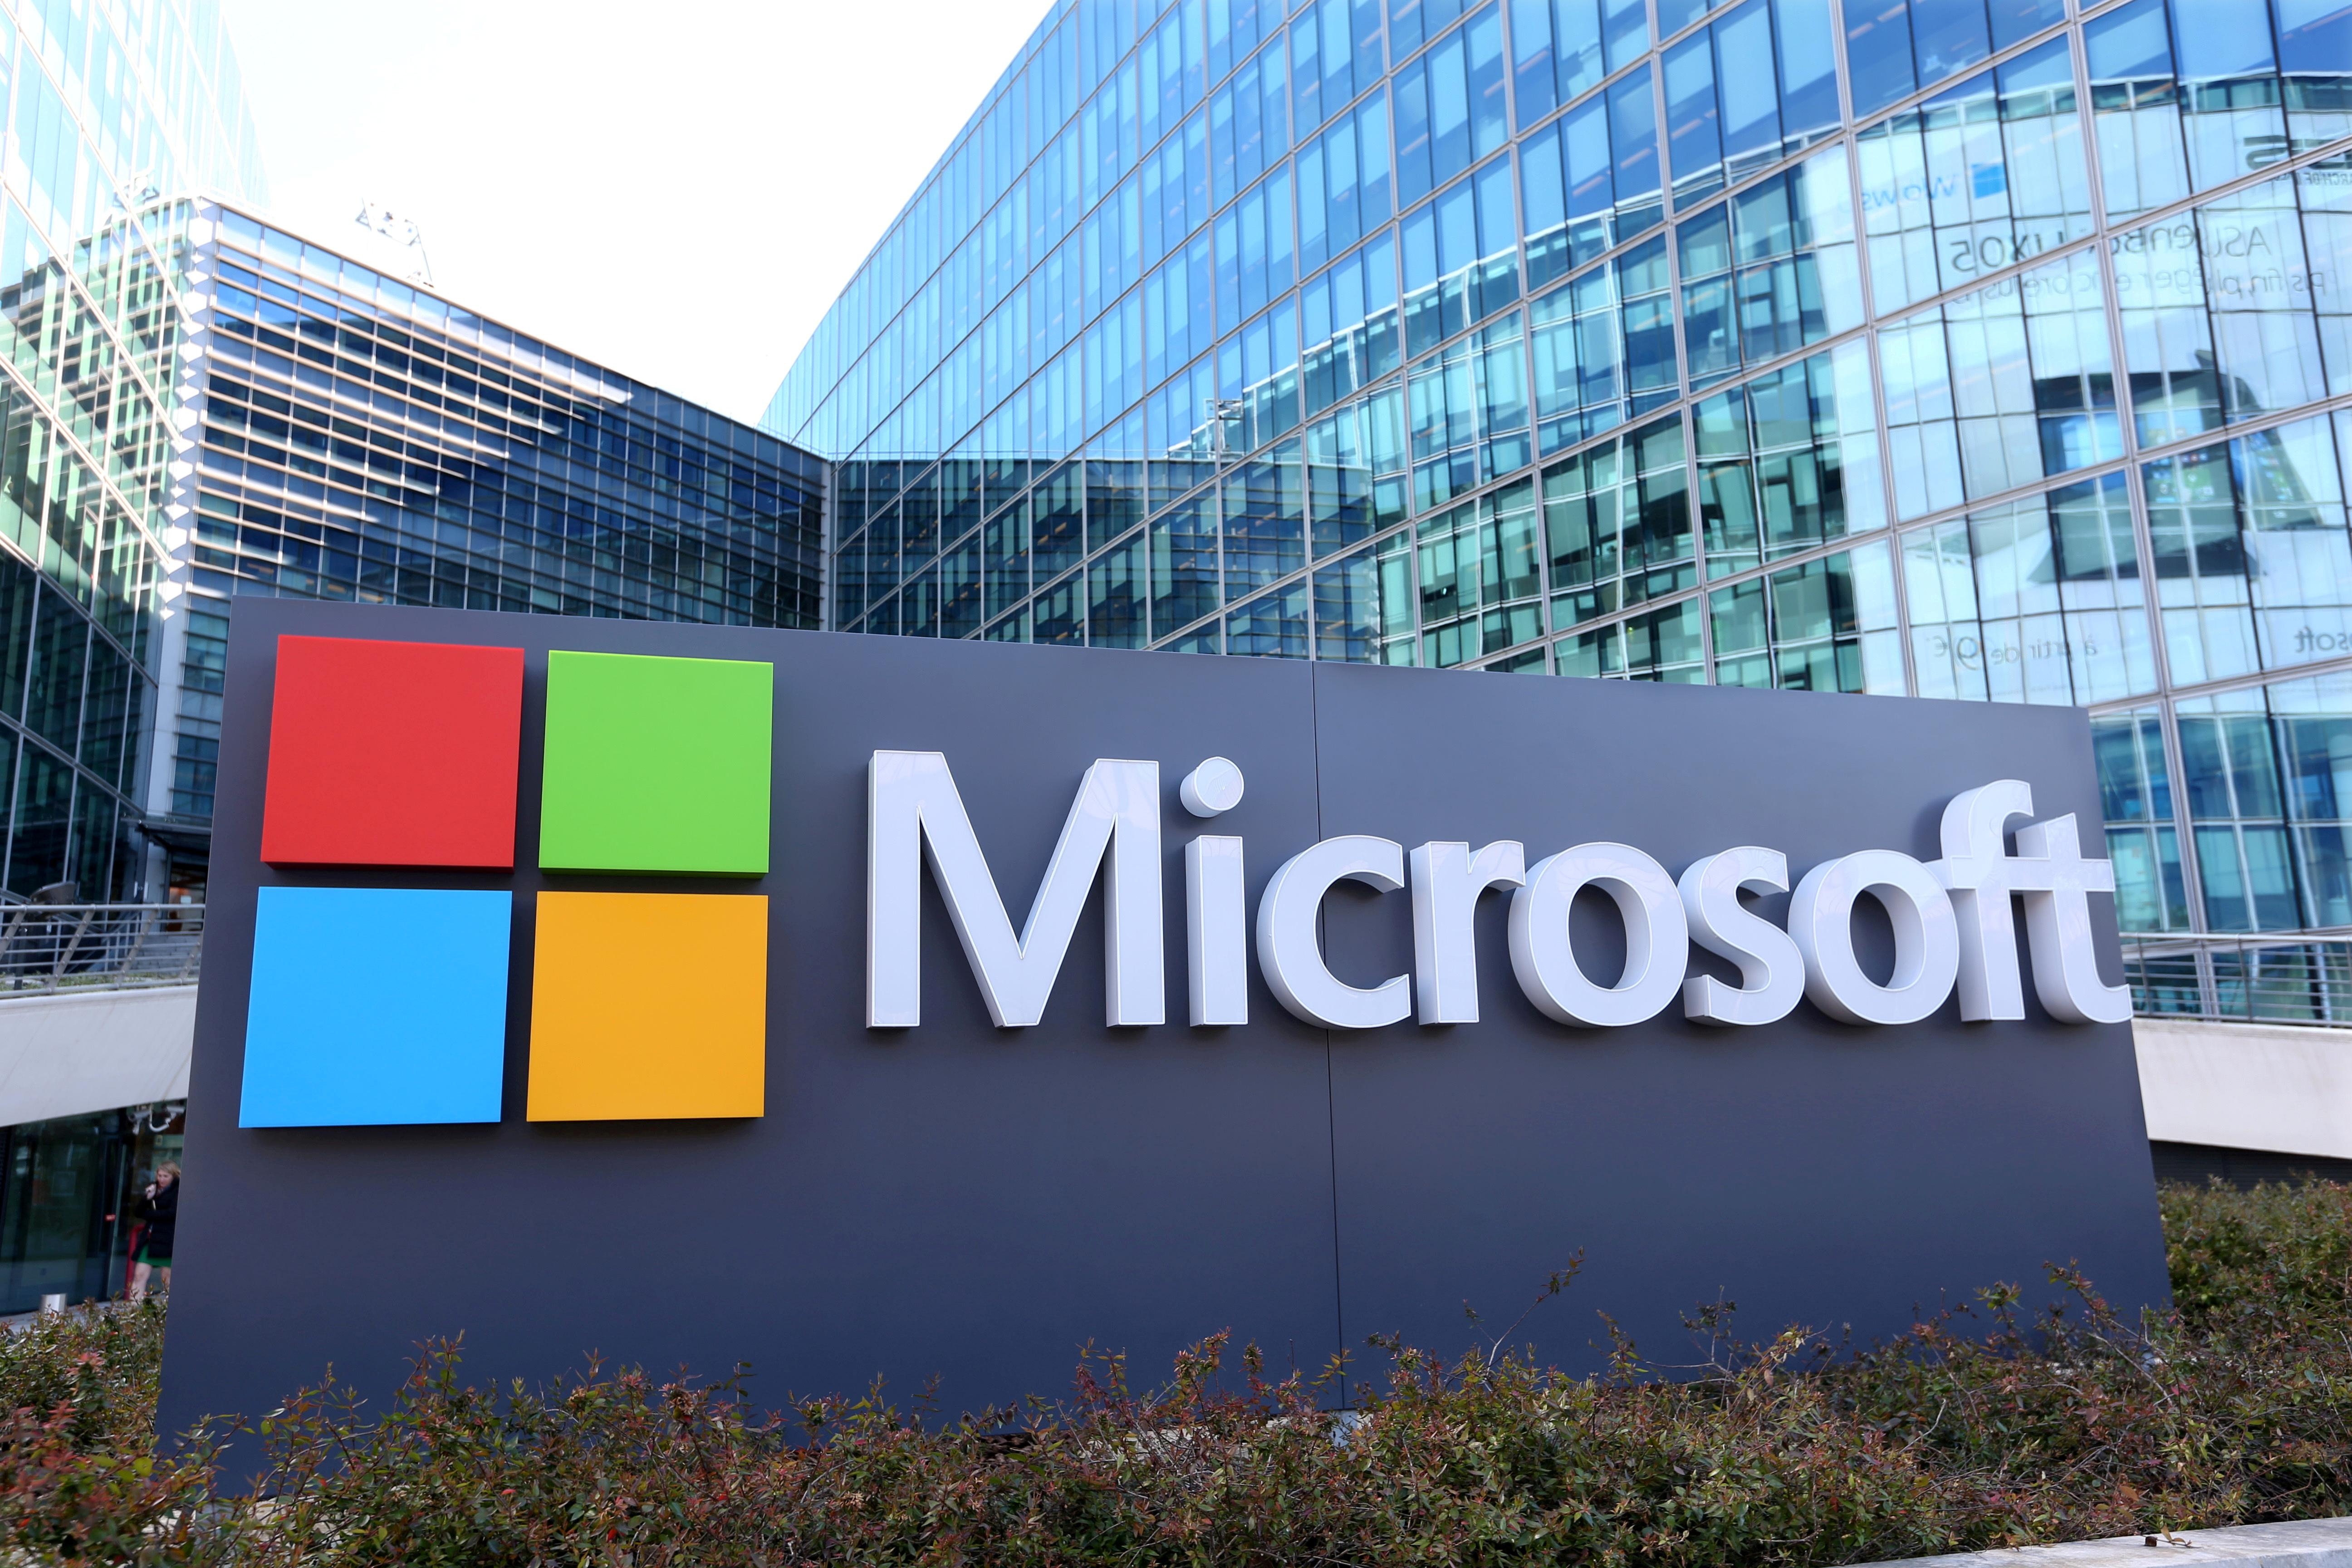 General view of Microsoft Corporation headquarters at Issy-les-Moulineaux, near Paris,  France, April 18, 2016. REUTERS/Charles Platiau